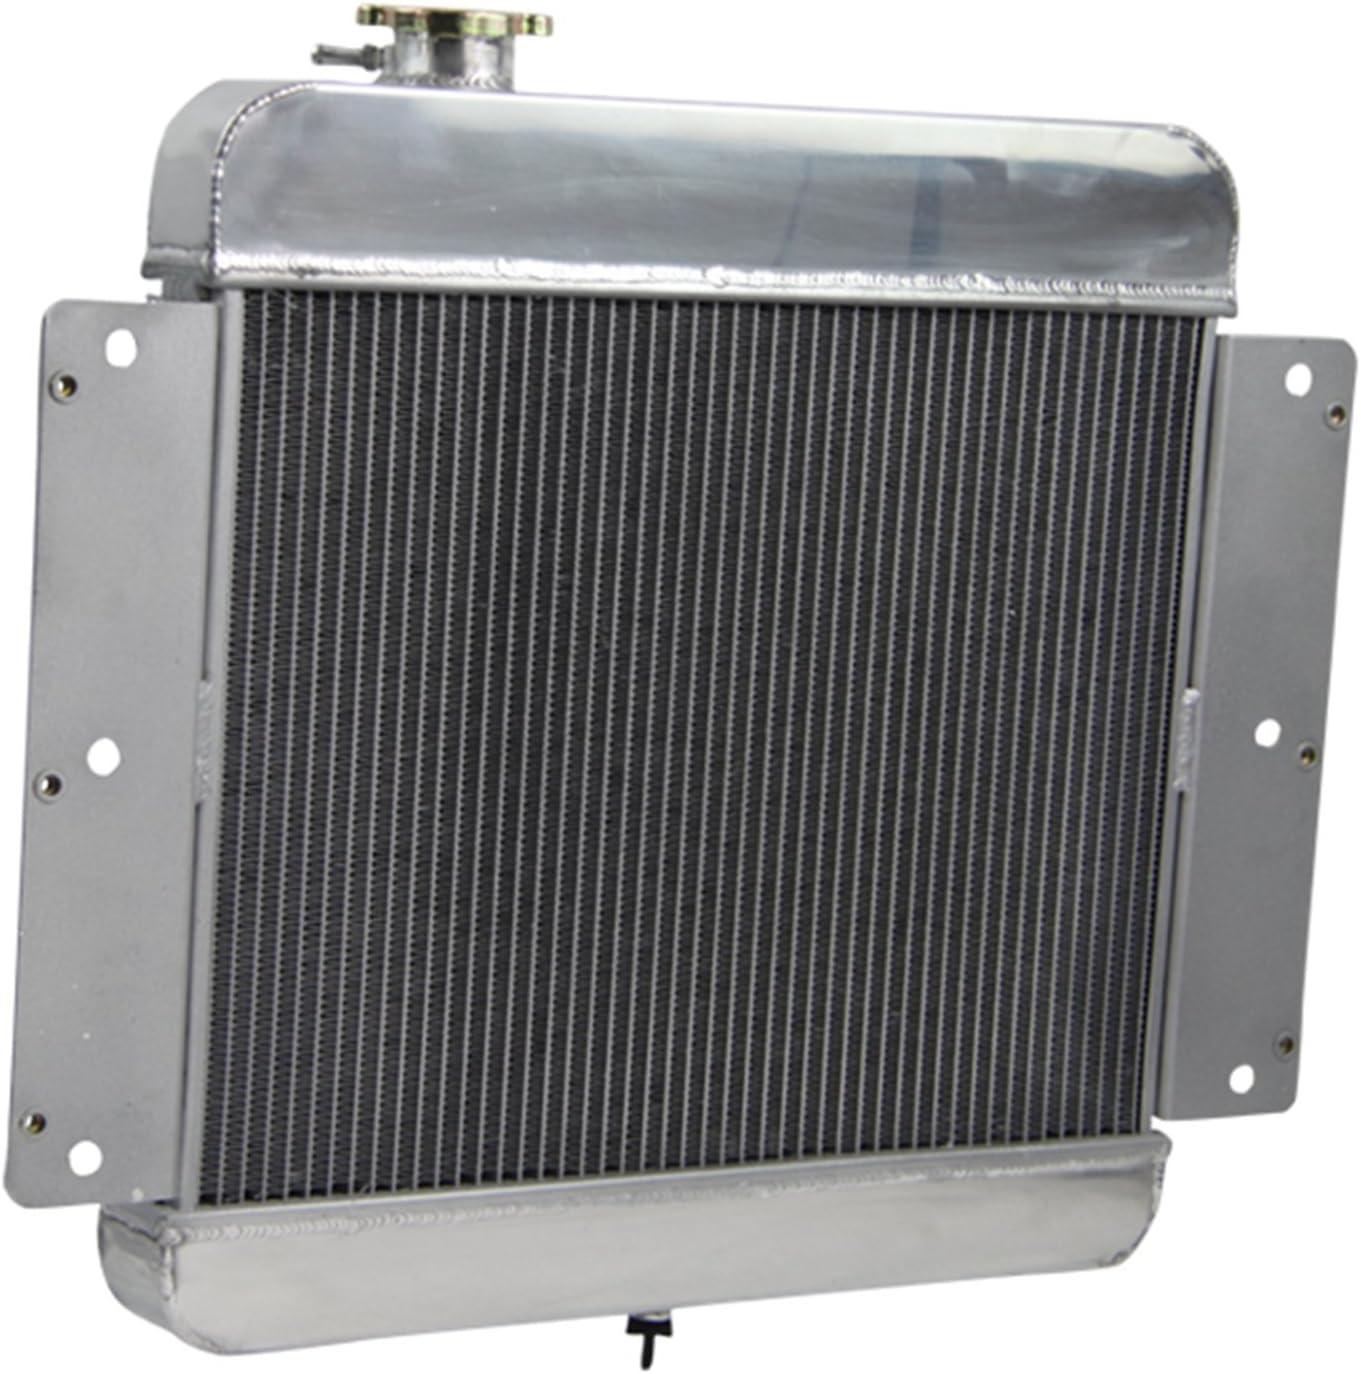 3Row Core Aluminum Radiator For Chevy Nova II Inline 6 CyL /& V8 Conversion 62-67